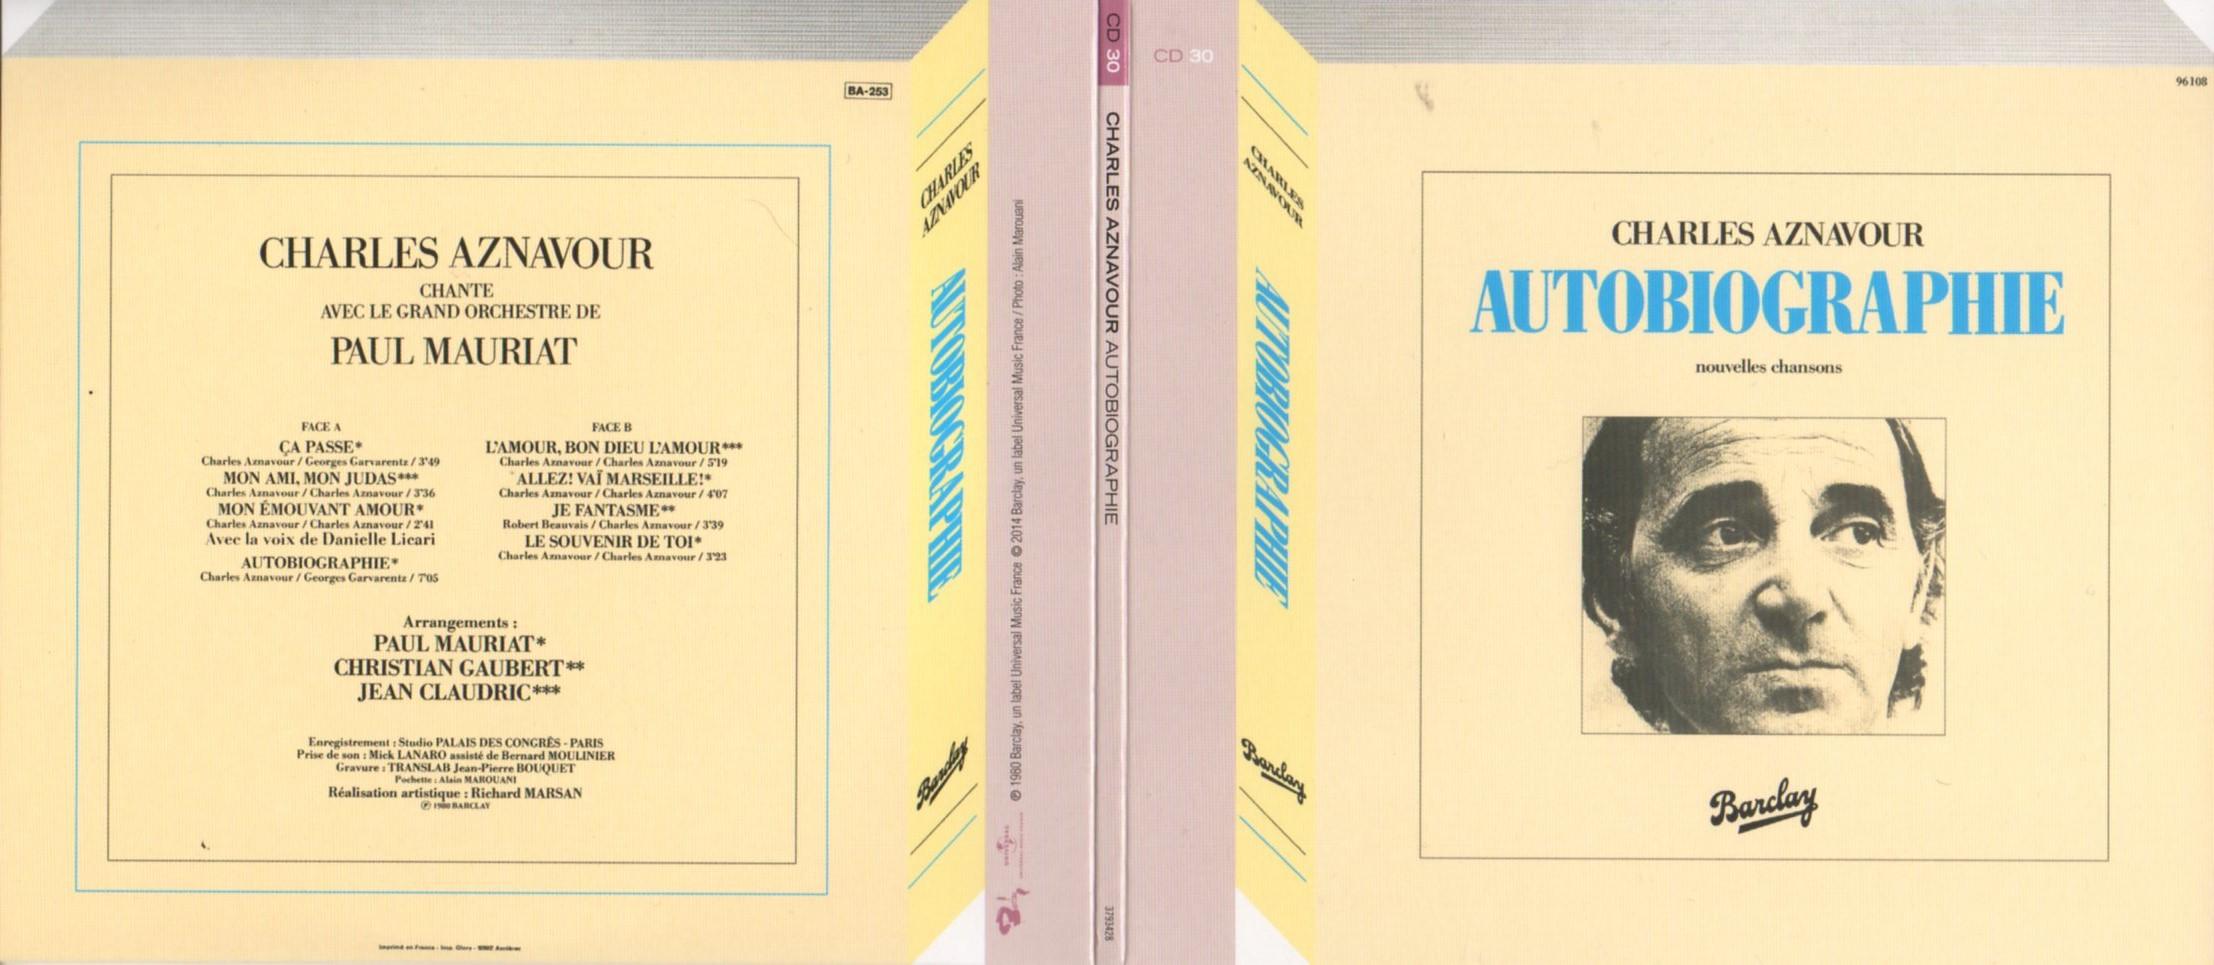 CHARLES AZNAVOUR - Autobiographie (1980) Gatefold Card board sleeve Replica - CD